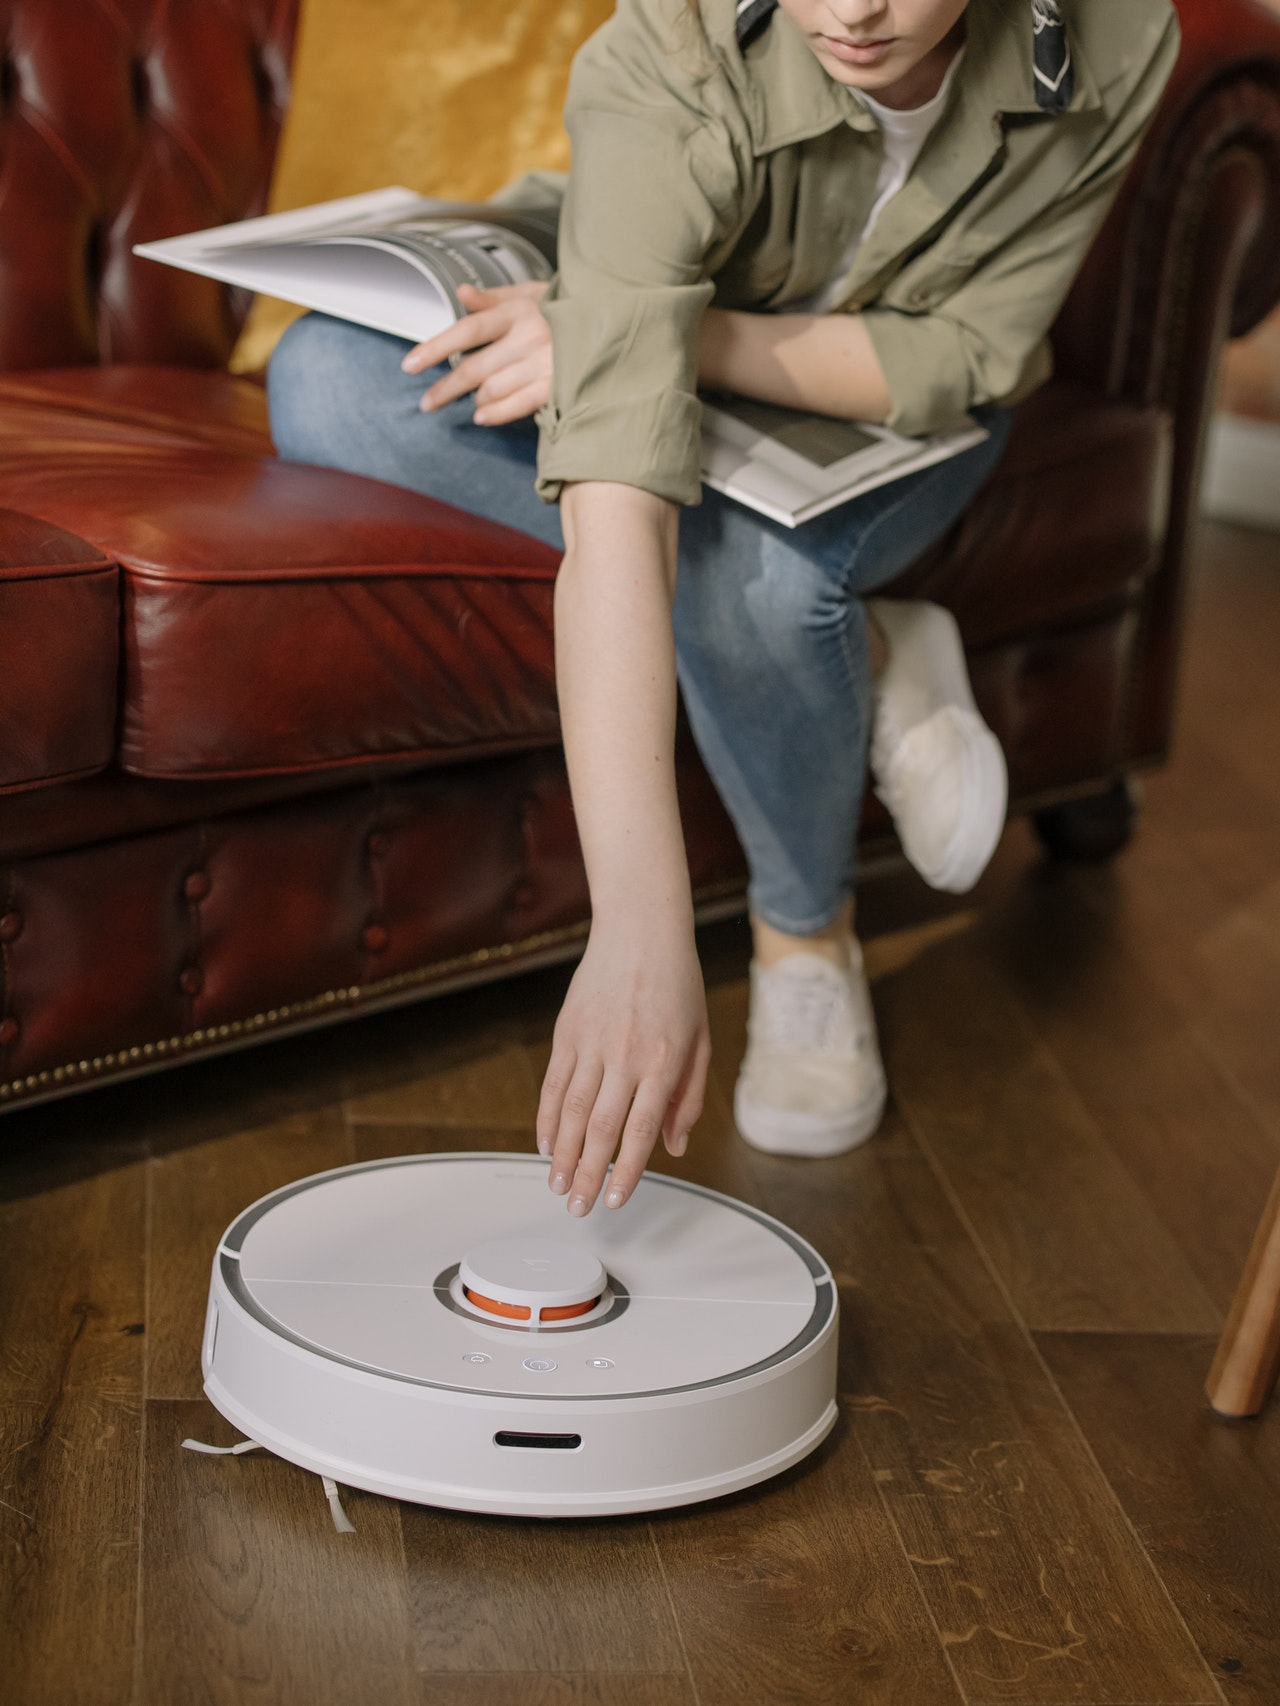 woman using robot vacuum cleaner